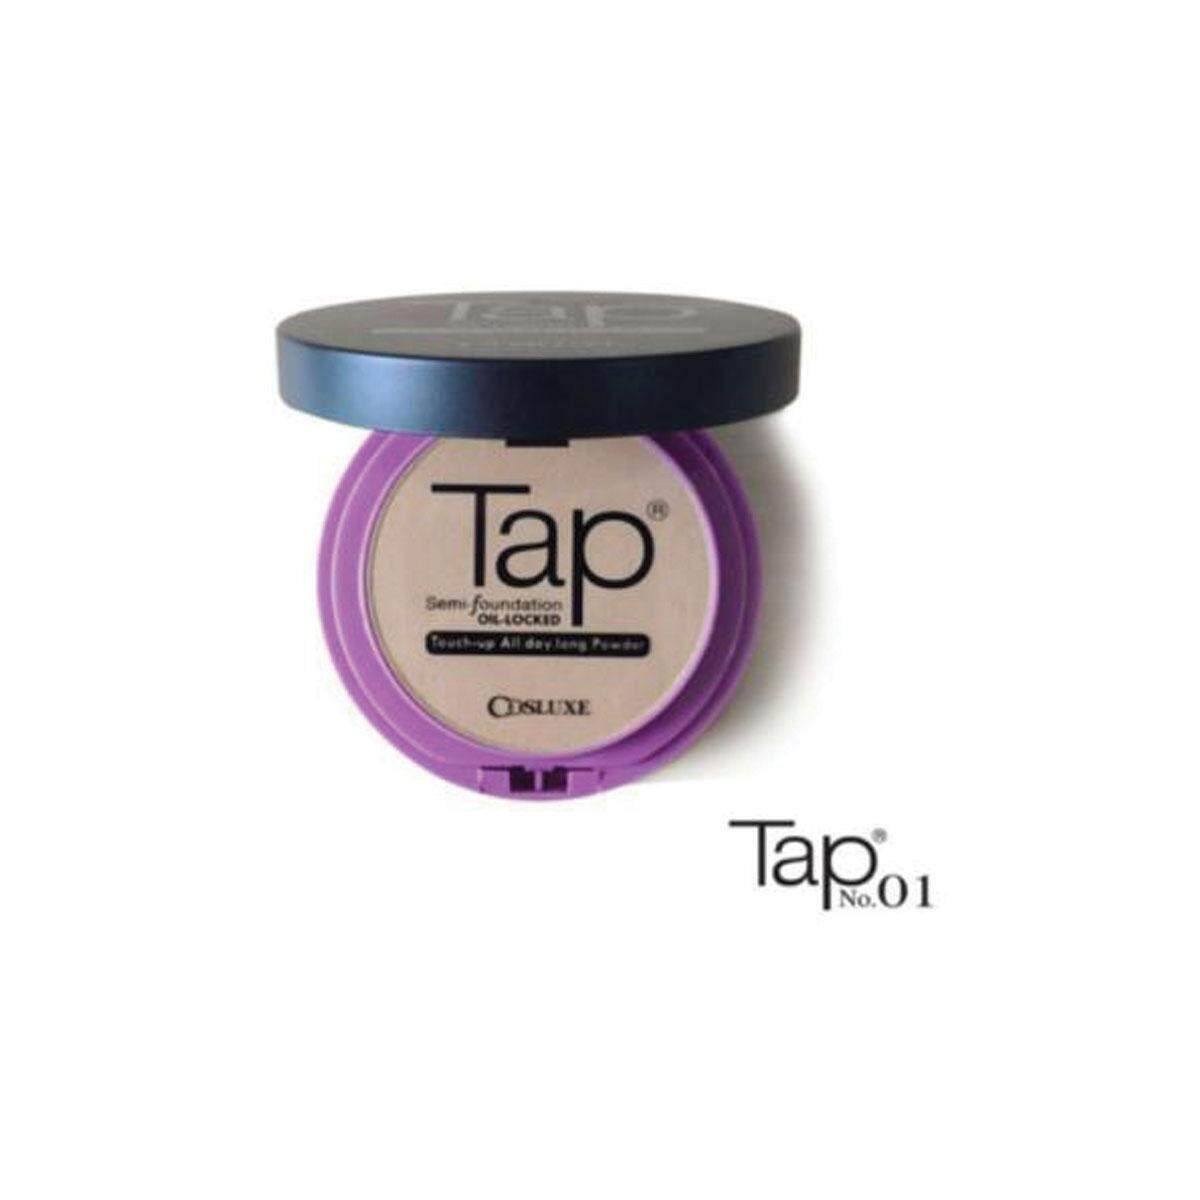 cosluxe tap powder semi-foundation สุดยอดแป้งขั้นเทพ มีให้เลือก 3 เฉดสี